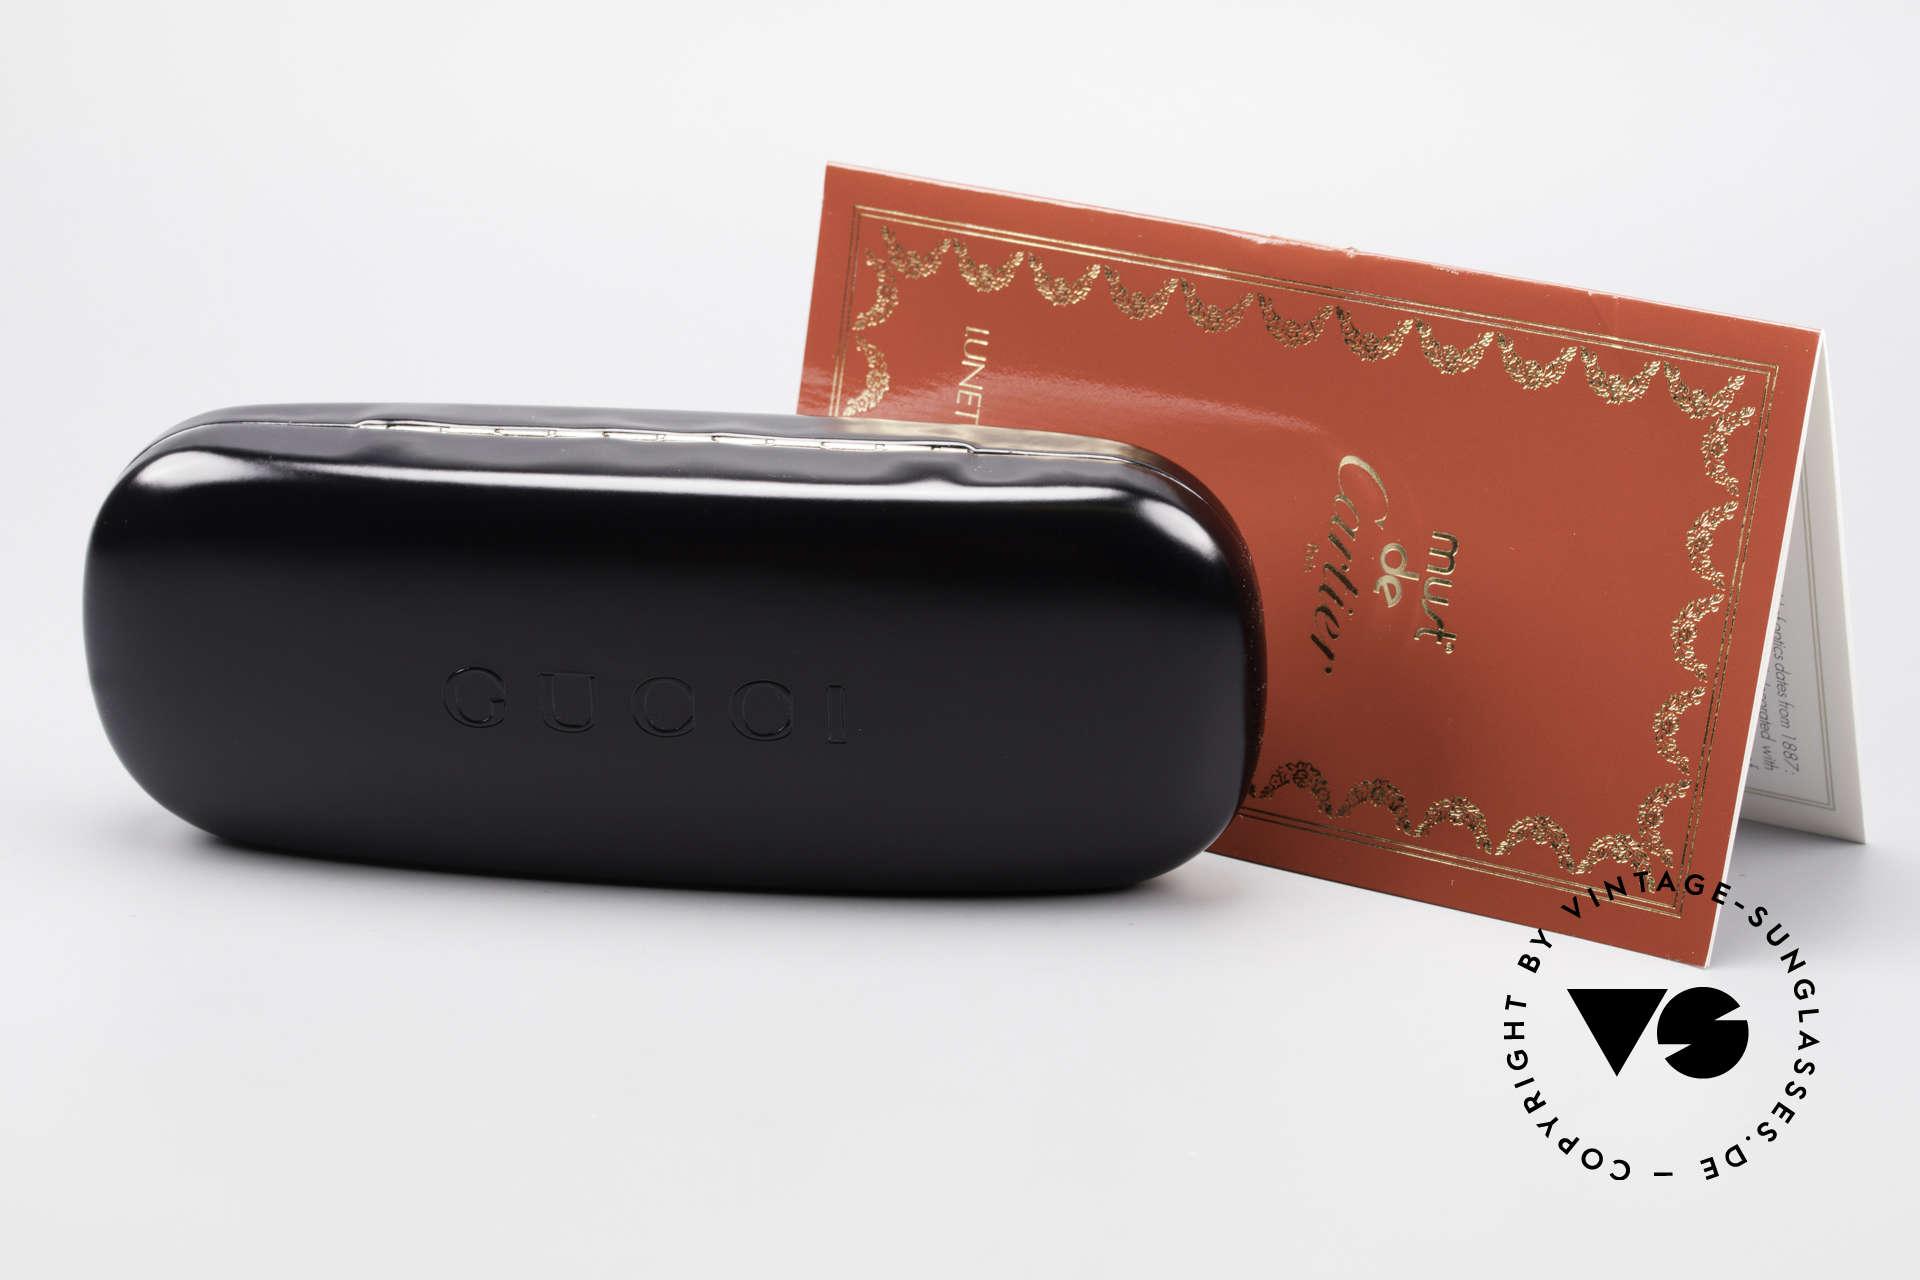 Cartier Vendome Laque - L Luxury Aviator Sunglasses, Size: large, Made for Men